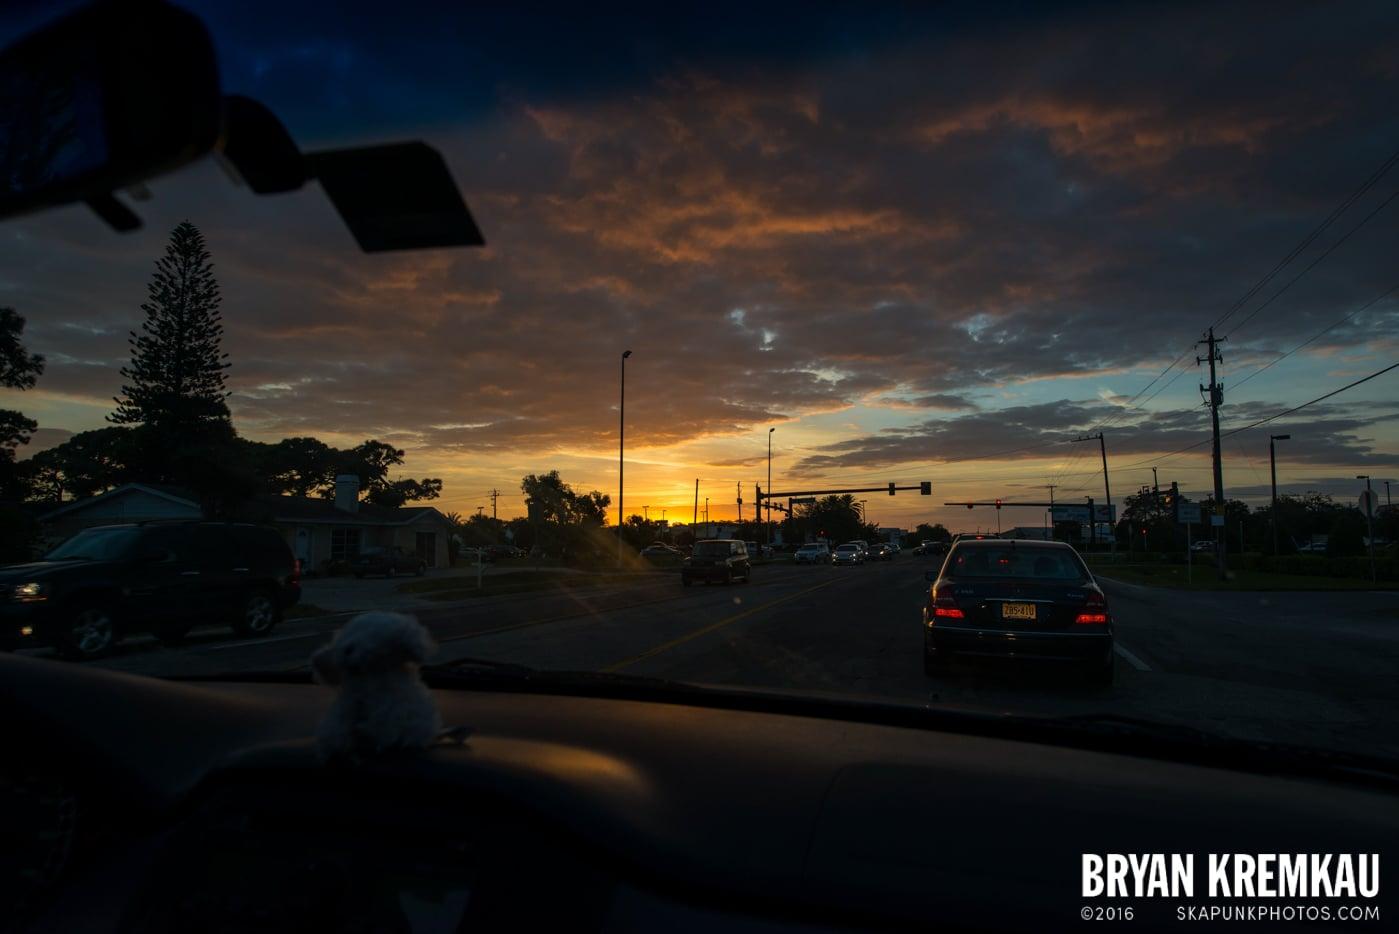 Sunsets, Astrophotography & Birds @ Venice, Florida - 10.25.14 - 11.5.14 (66)